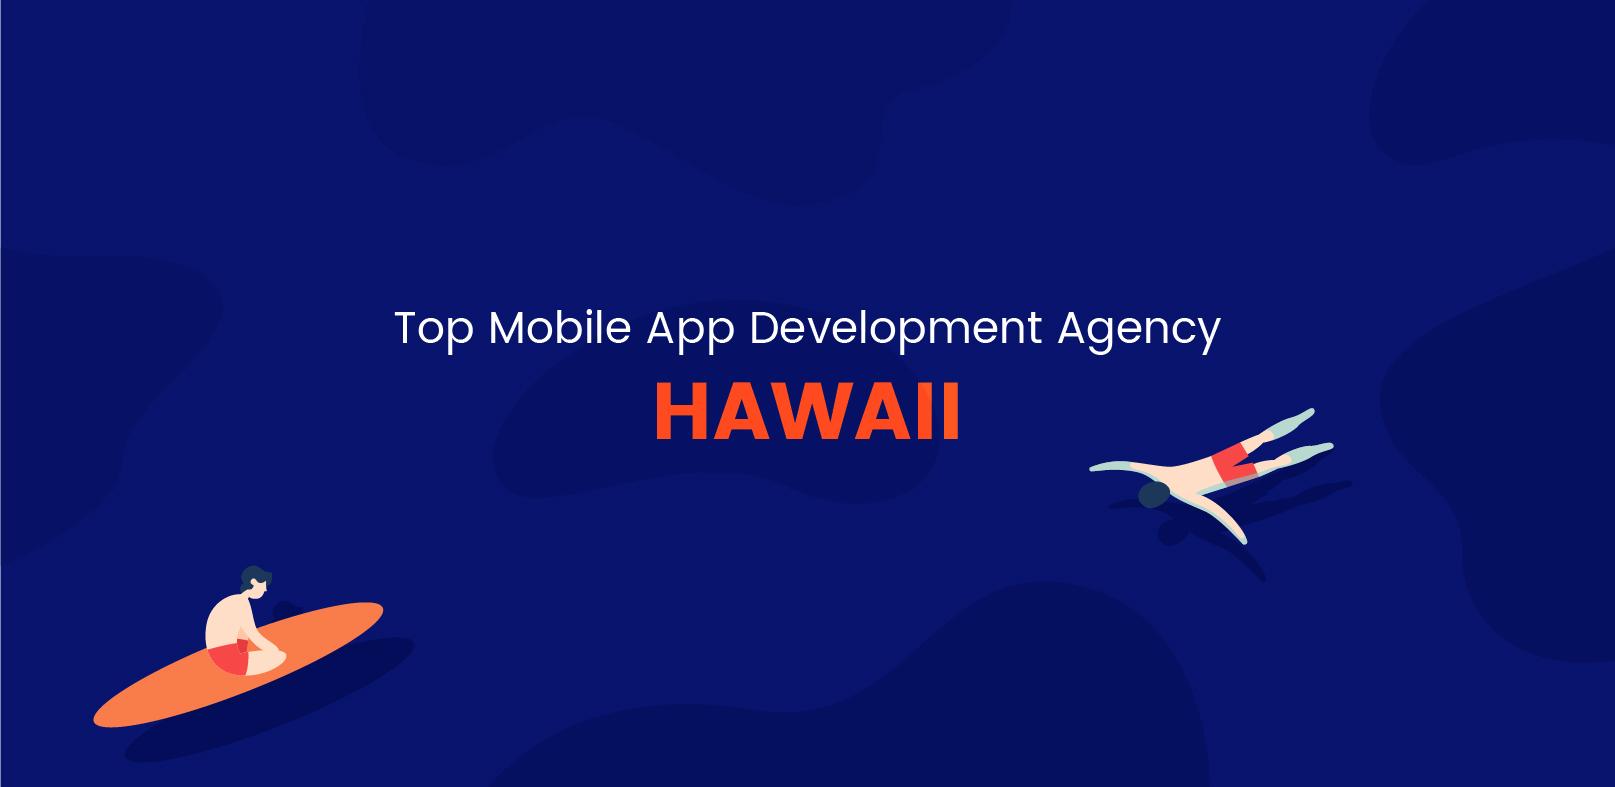 Top Mobile App Development Agency in Hawaii - WebClues Infotech